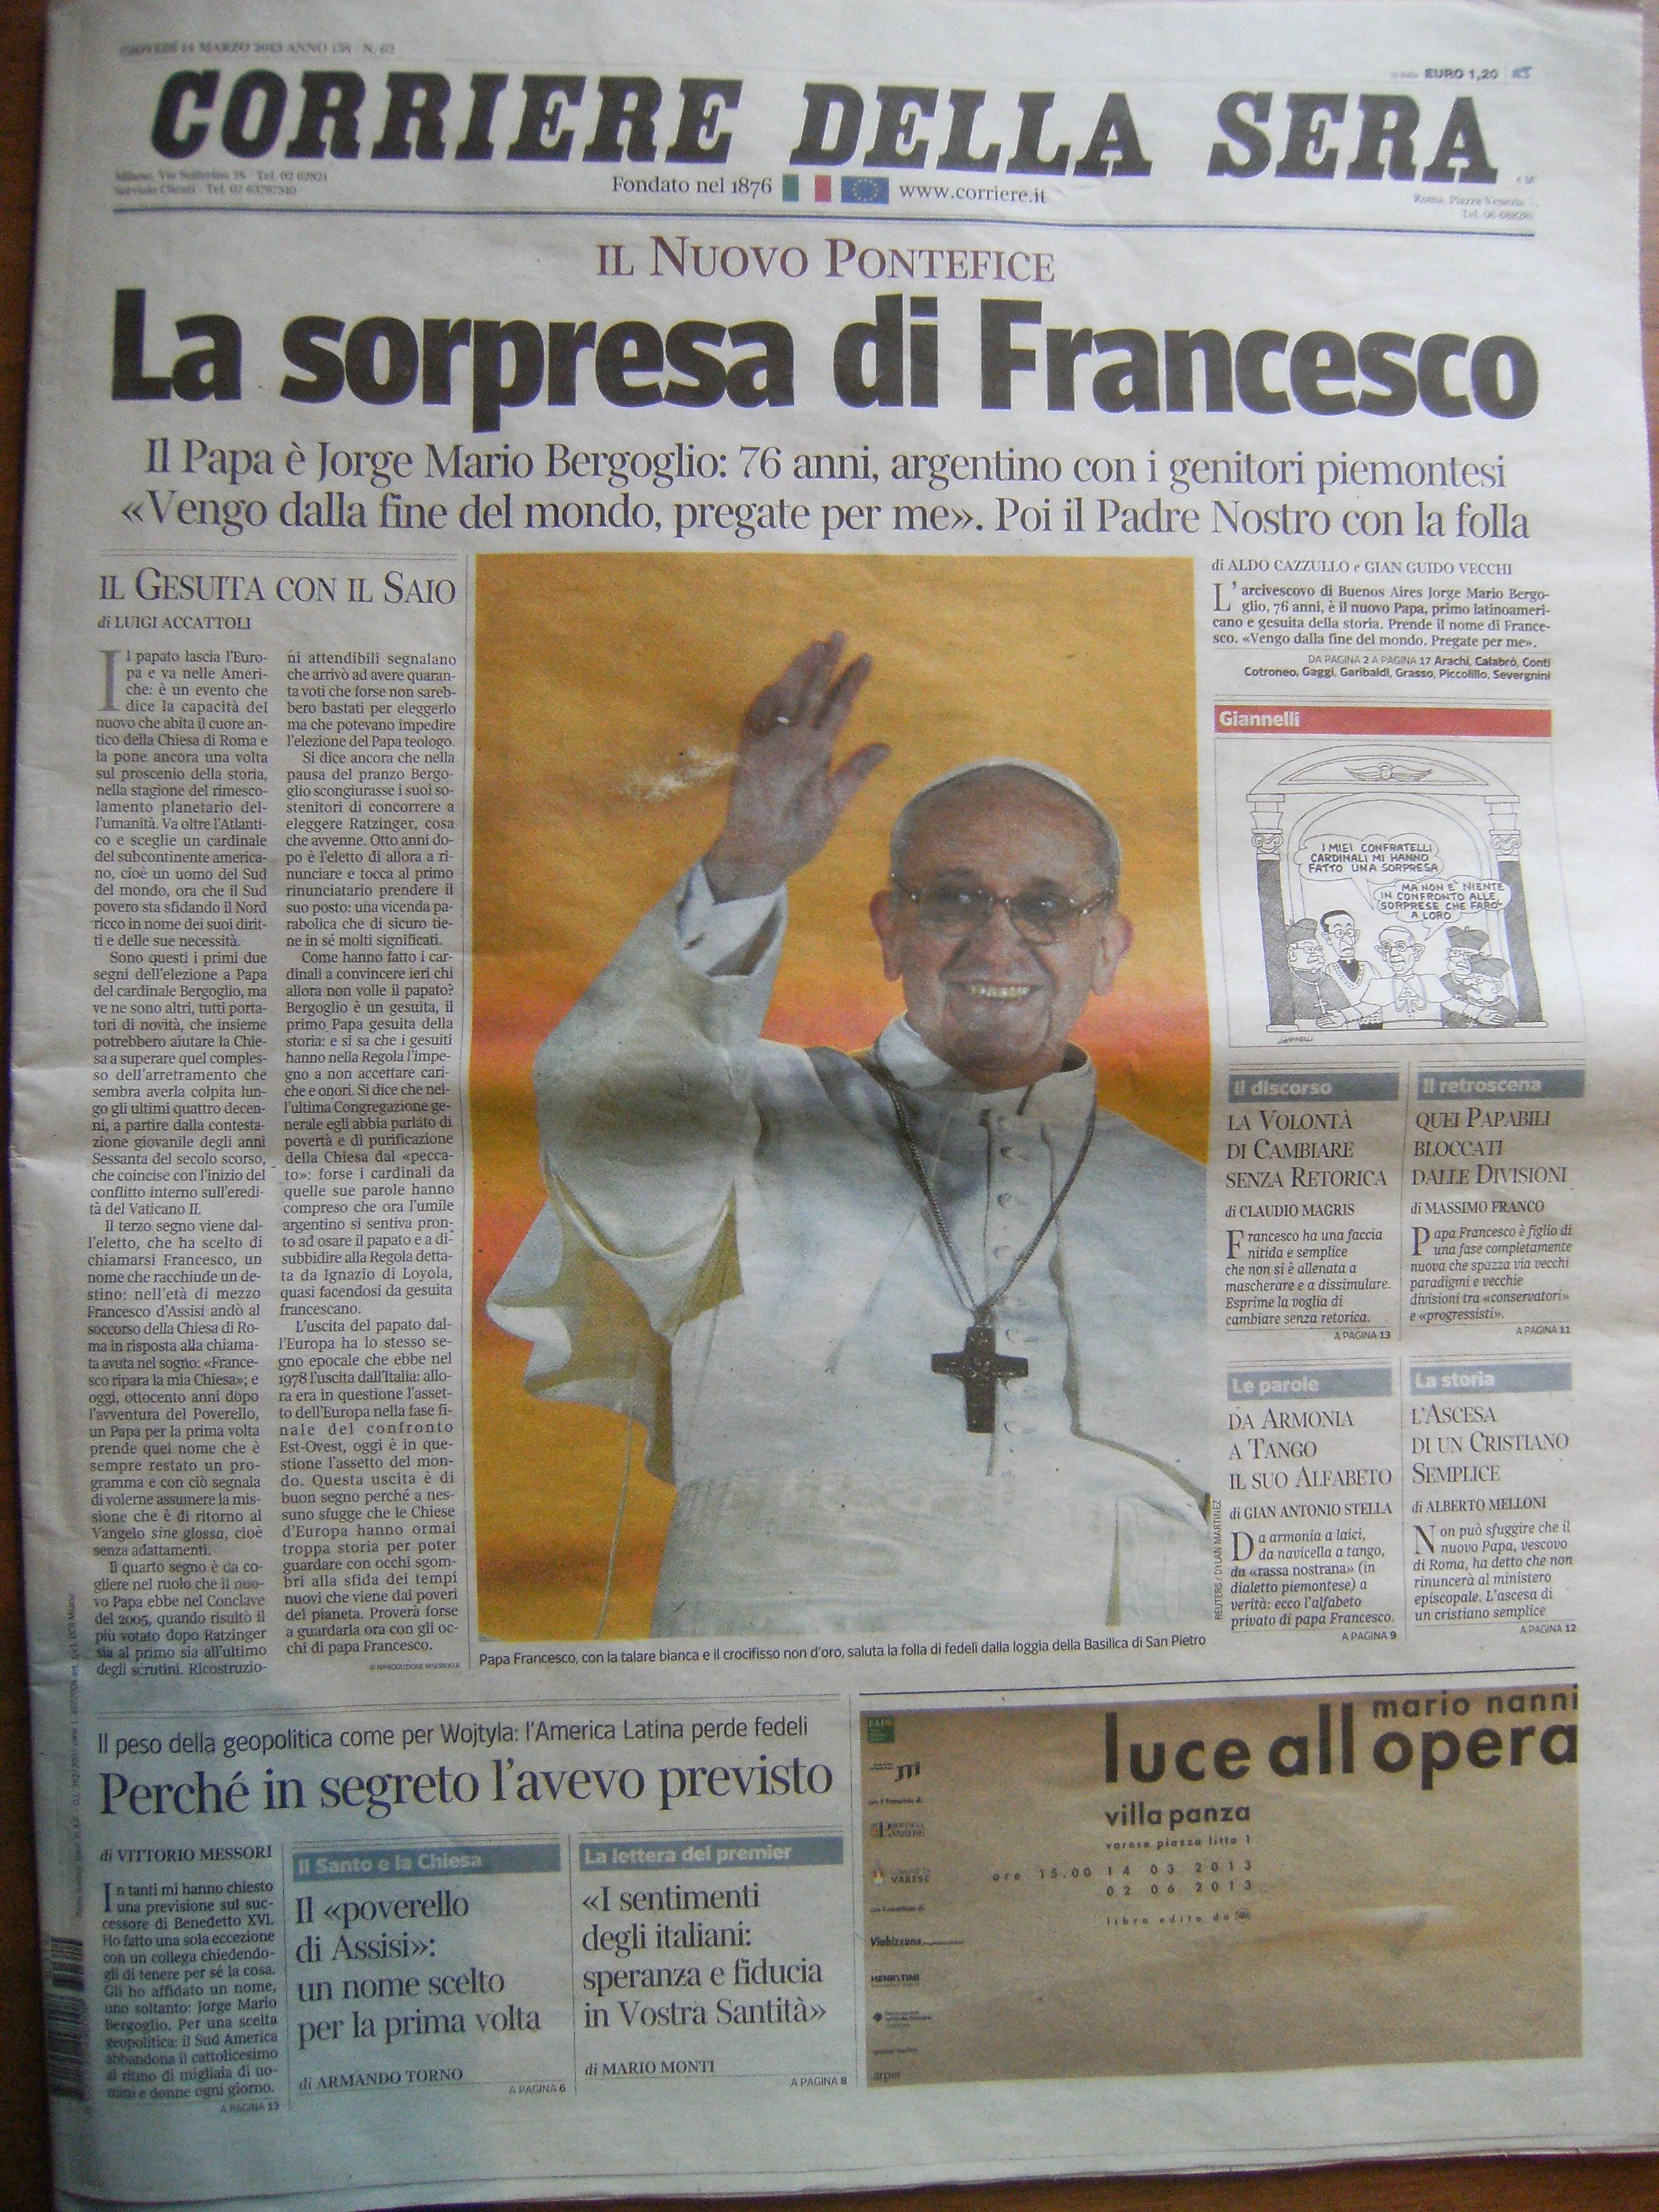 de corriere della sera del 14 marzo 2013 pagina 2 pagina 3 pagina 5 pagina 6 pagina 8 pagina 9 pagina 10 pagina 11 pagina 12 pagina 13